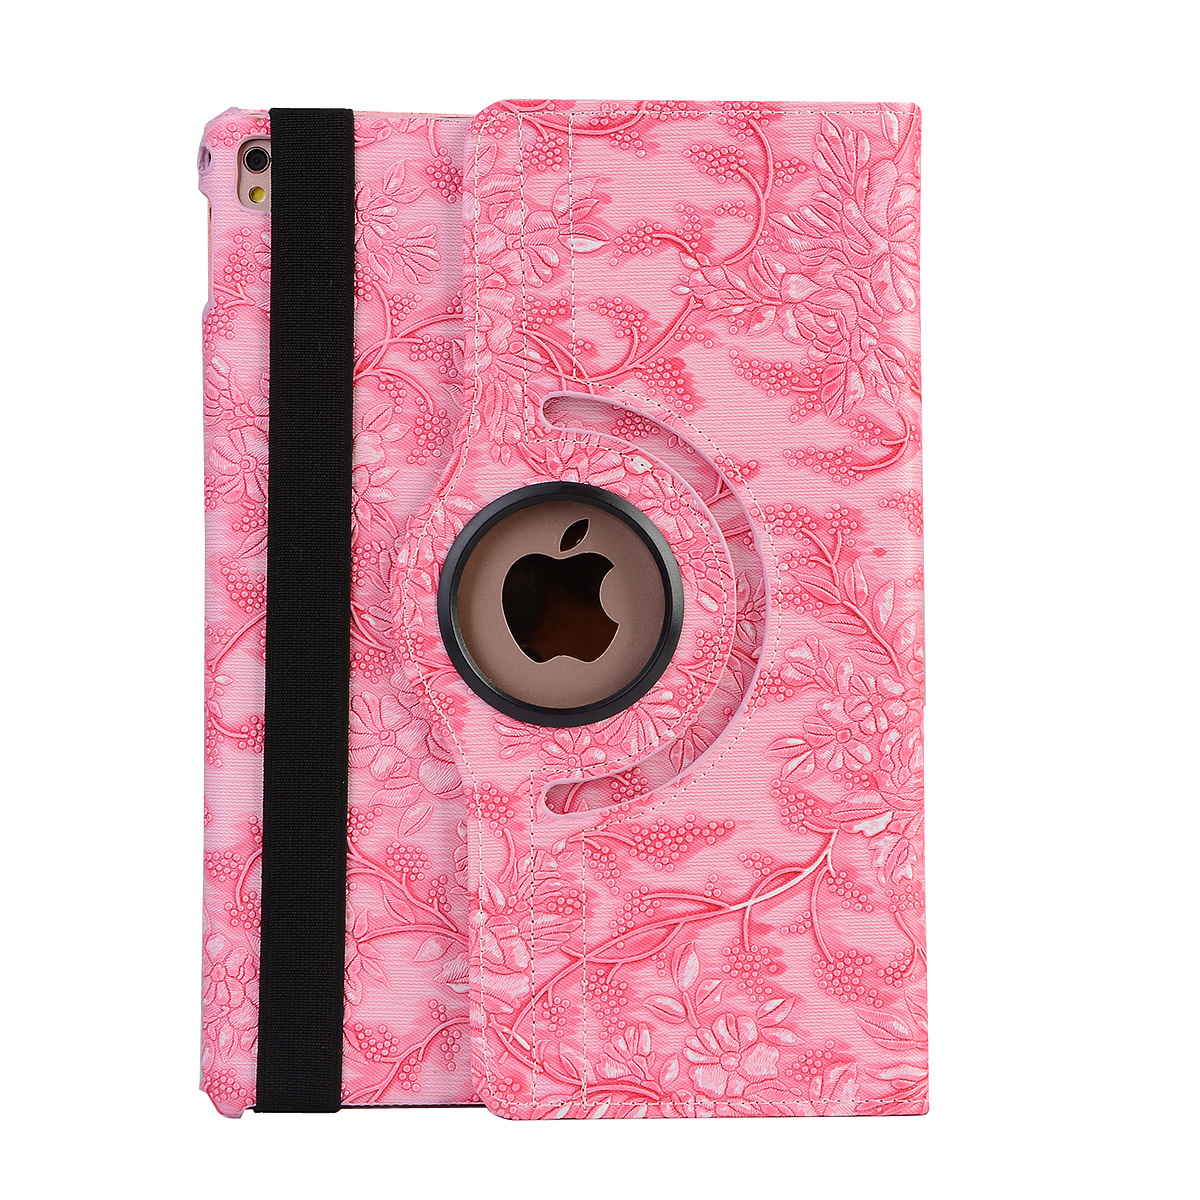 Läderfodral blommor rosa, iPad Air 3, Pro 10.5